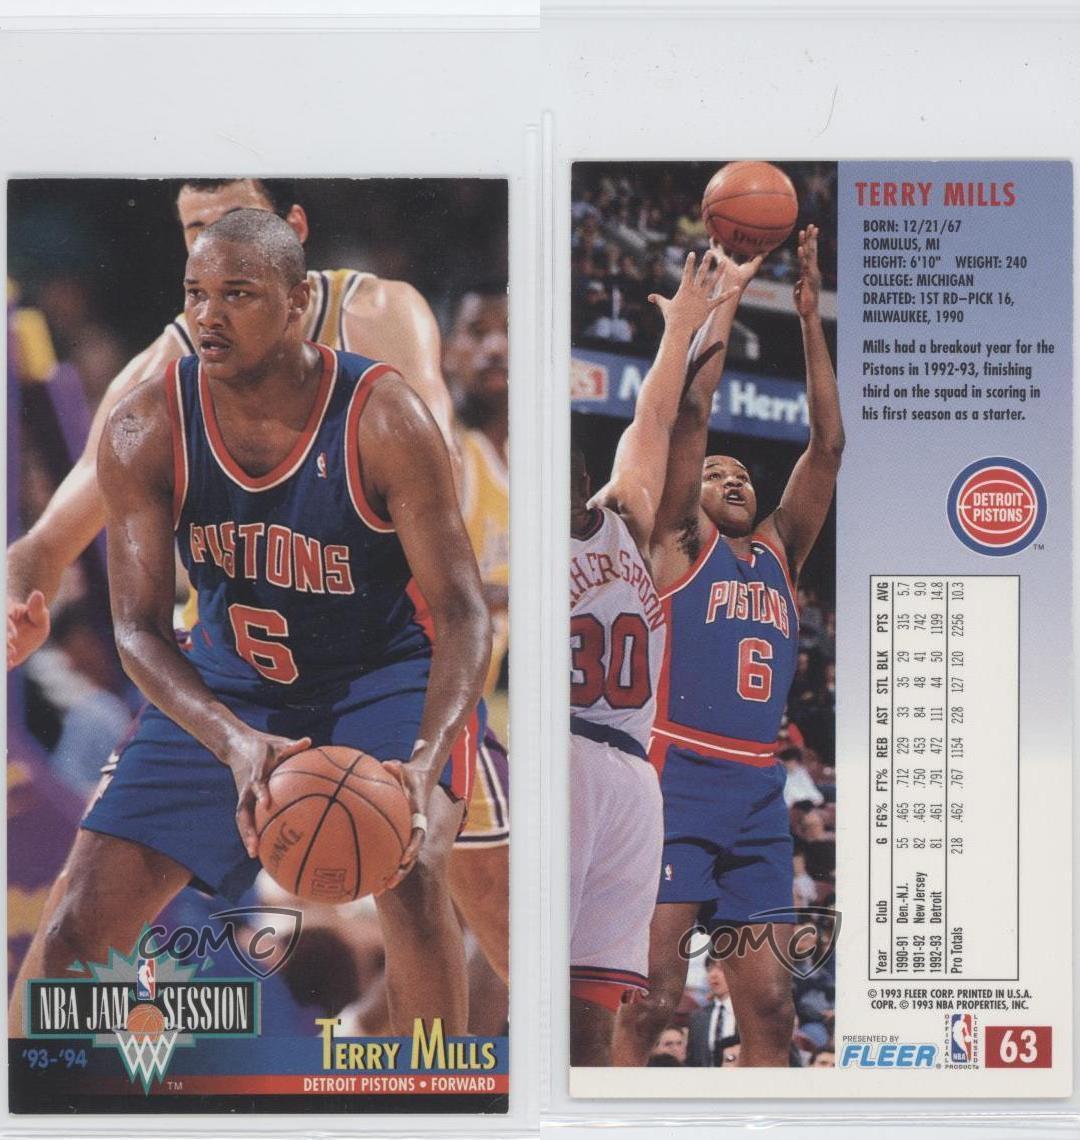 1993-94 NBA Jam Session #63 Terry Mills Detroit Pistons